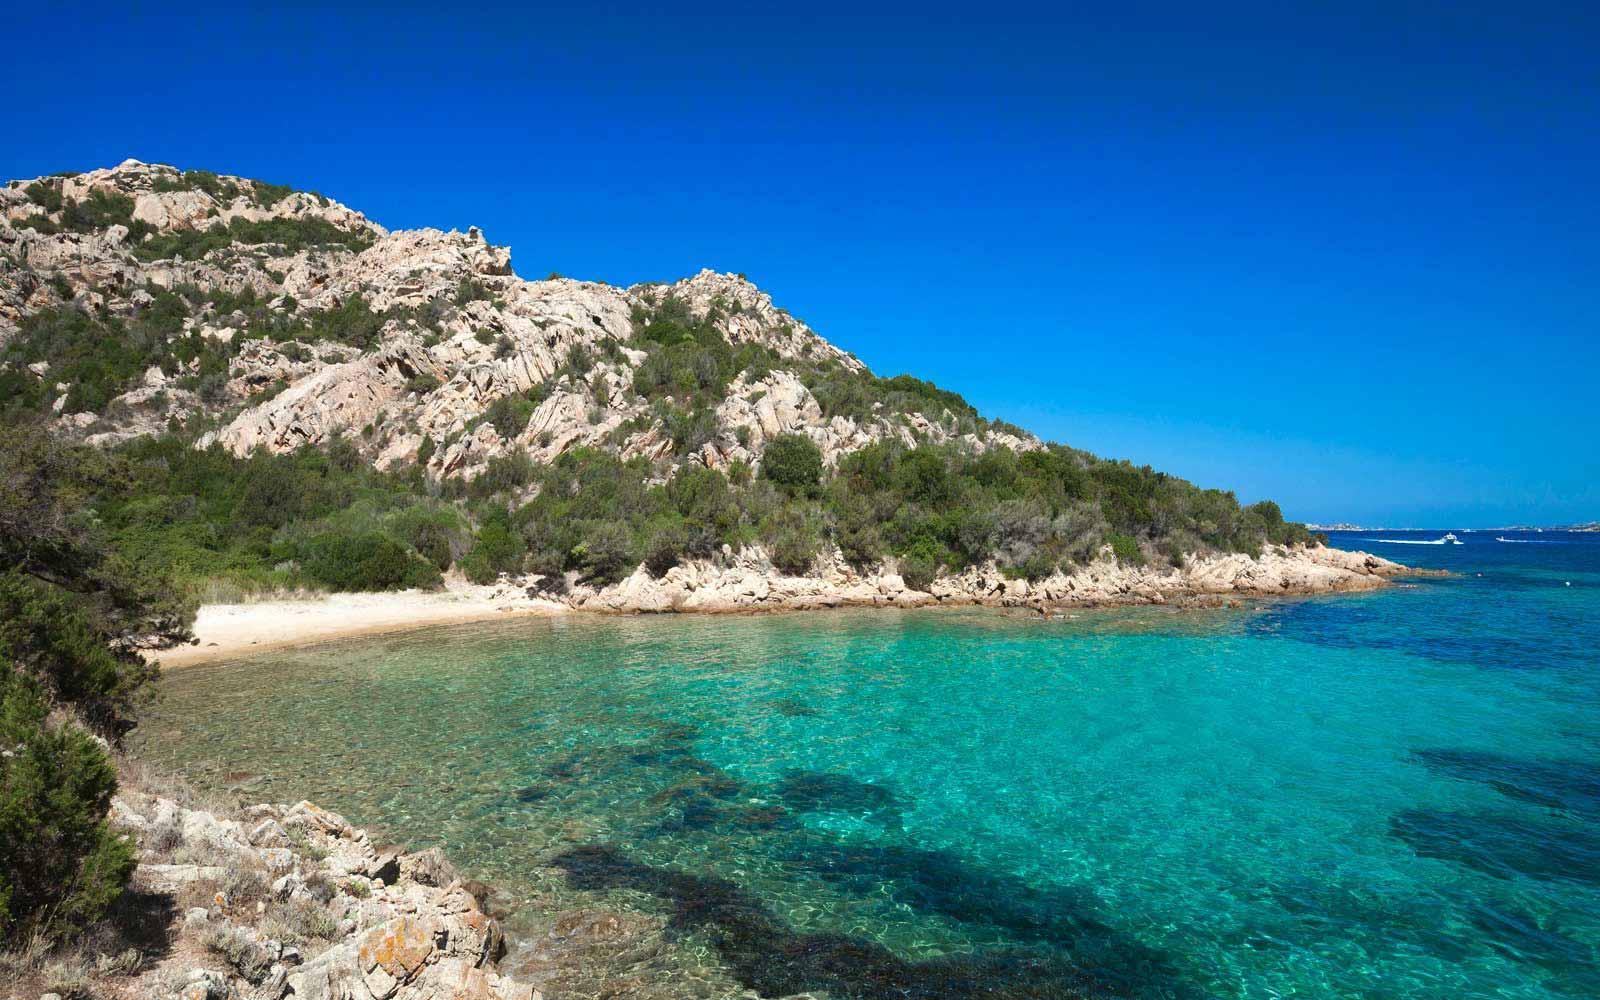 Cala Selvaggia beach by Hotel Capo D'Orso Thalasso & Spa